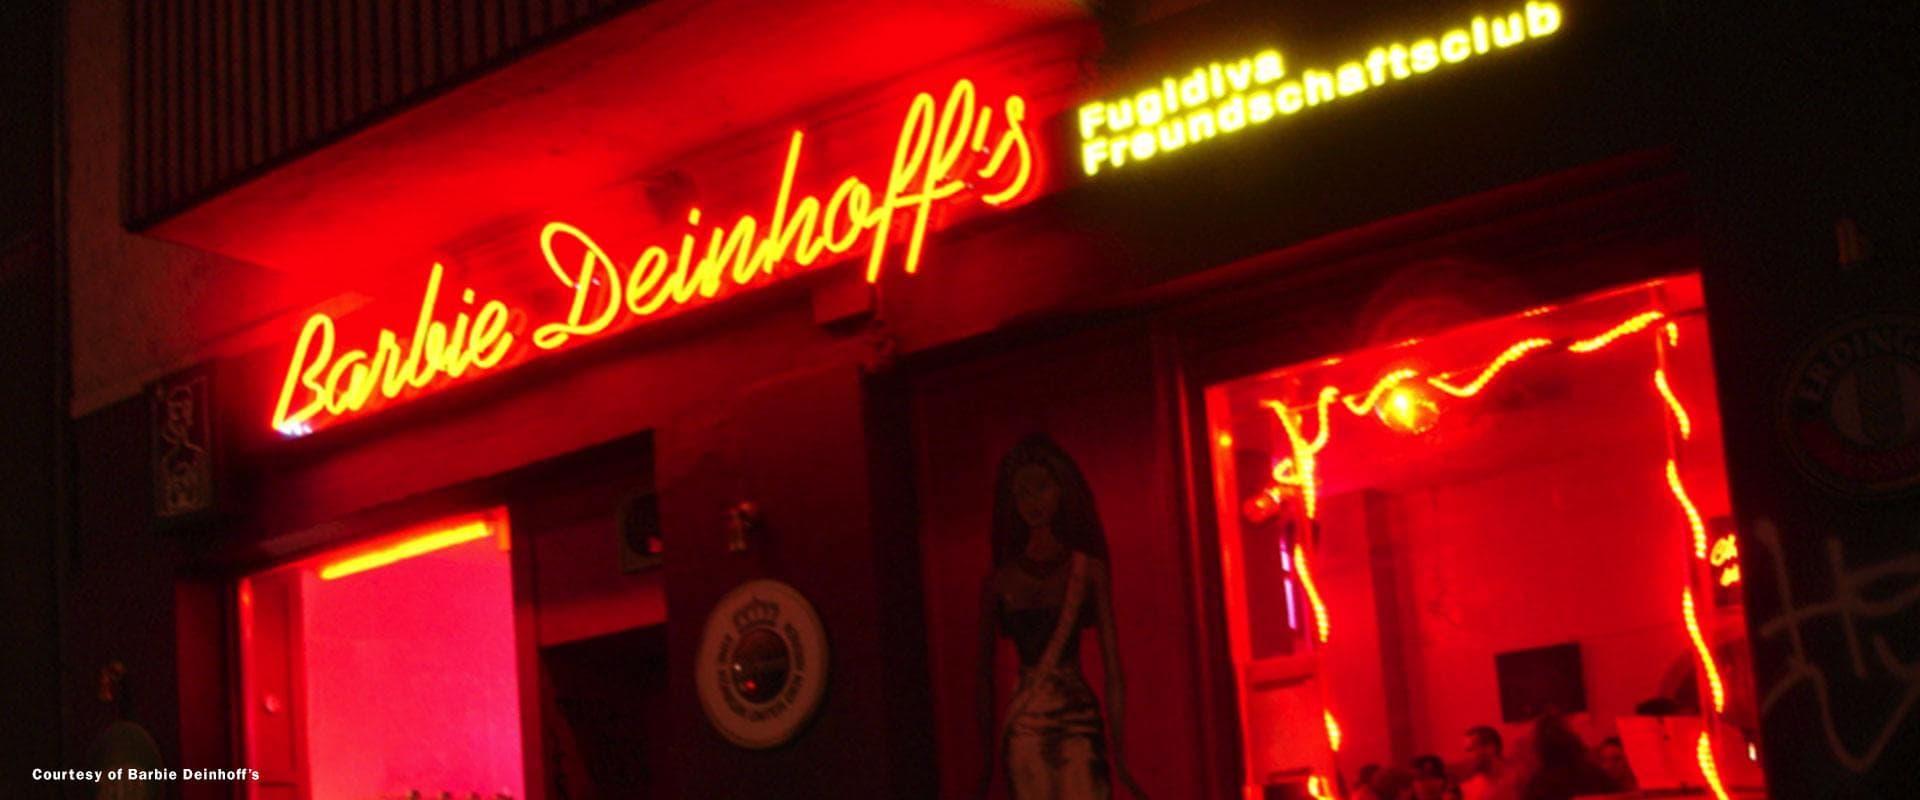 Unleash your mind at Barbie Deinhoff's